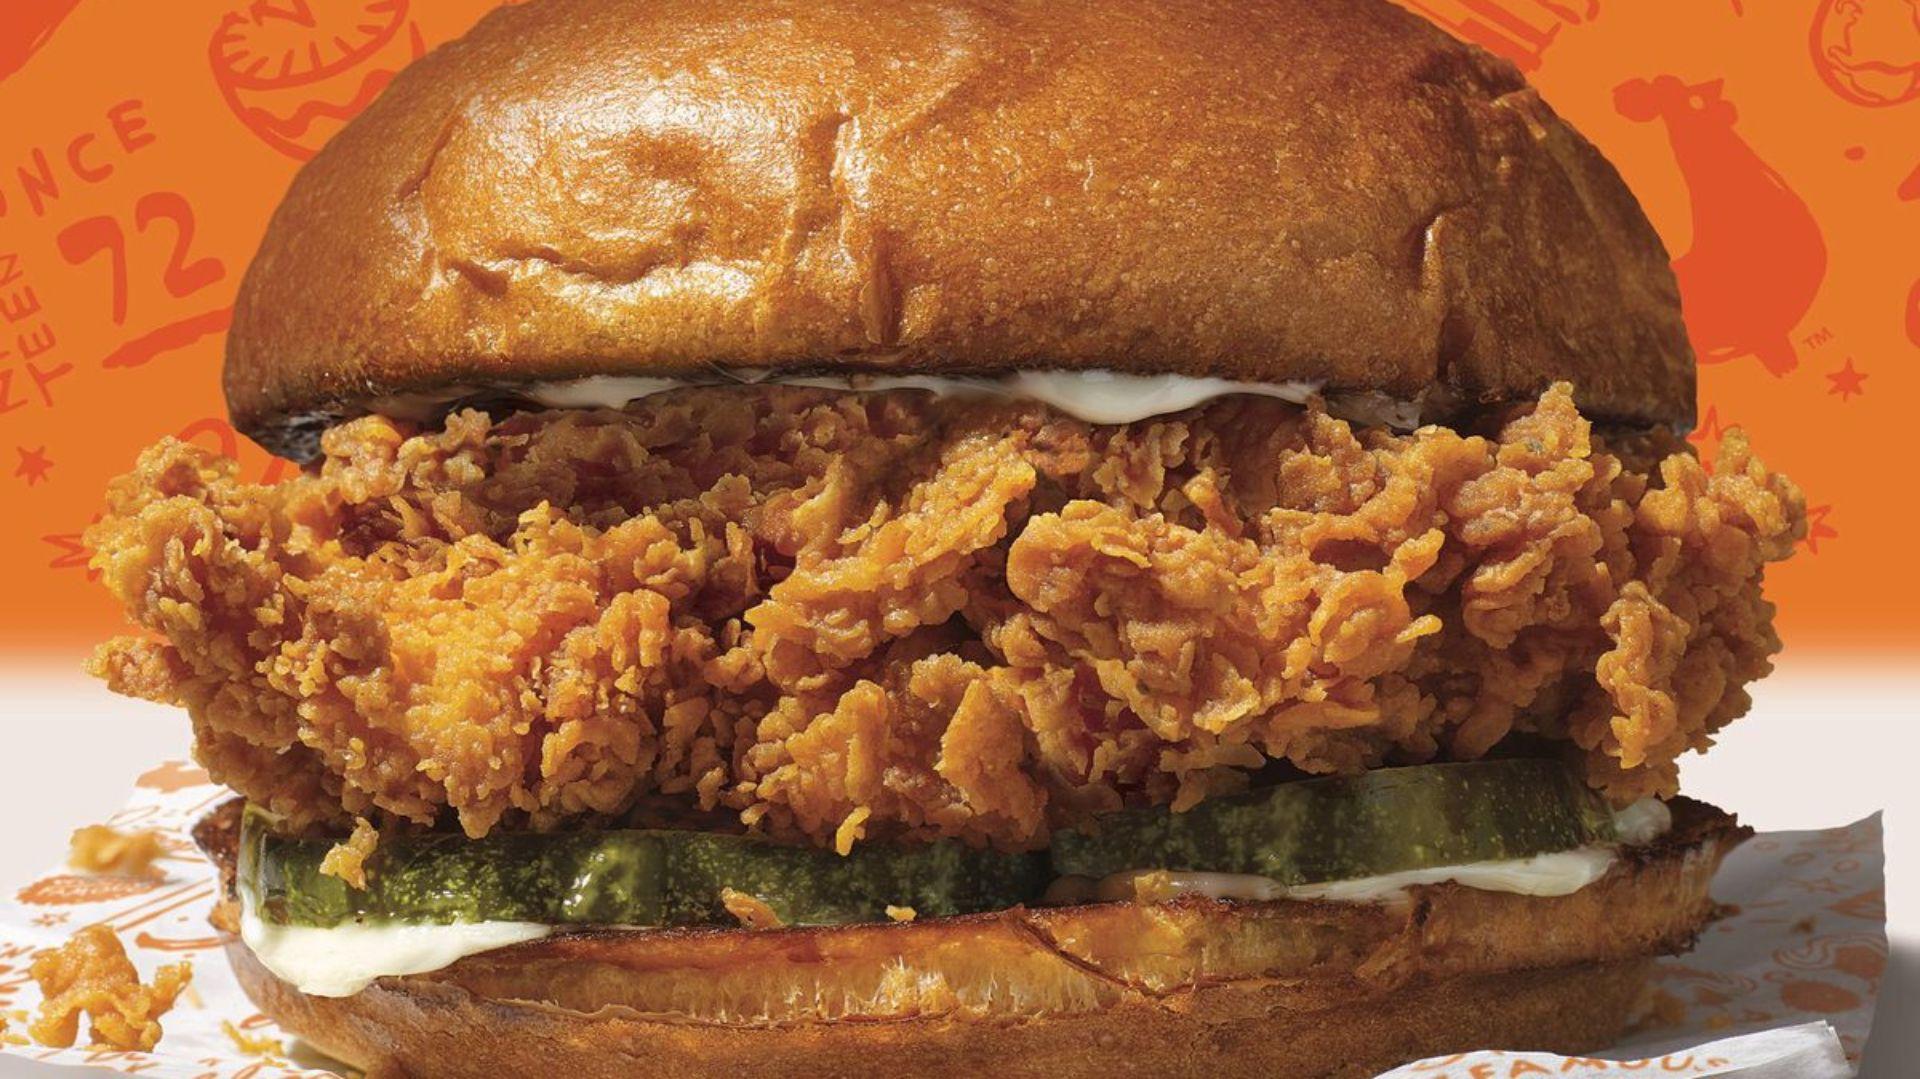 A Recap Of The Popeyes vs Chic-Fil-A vs Wendy's vs Everybody Chicken Sandwich Battle